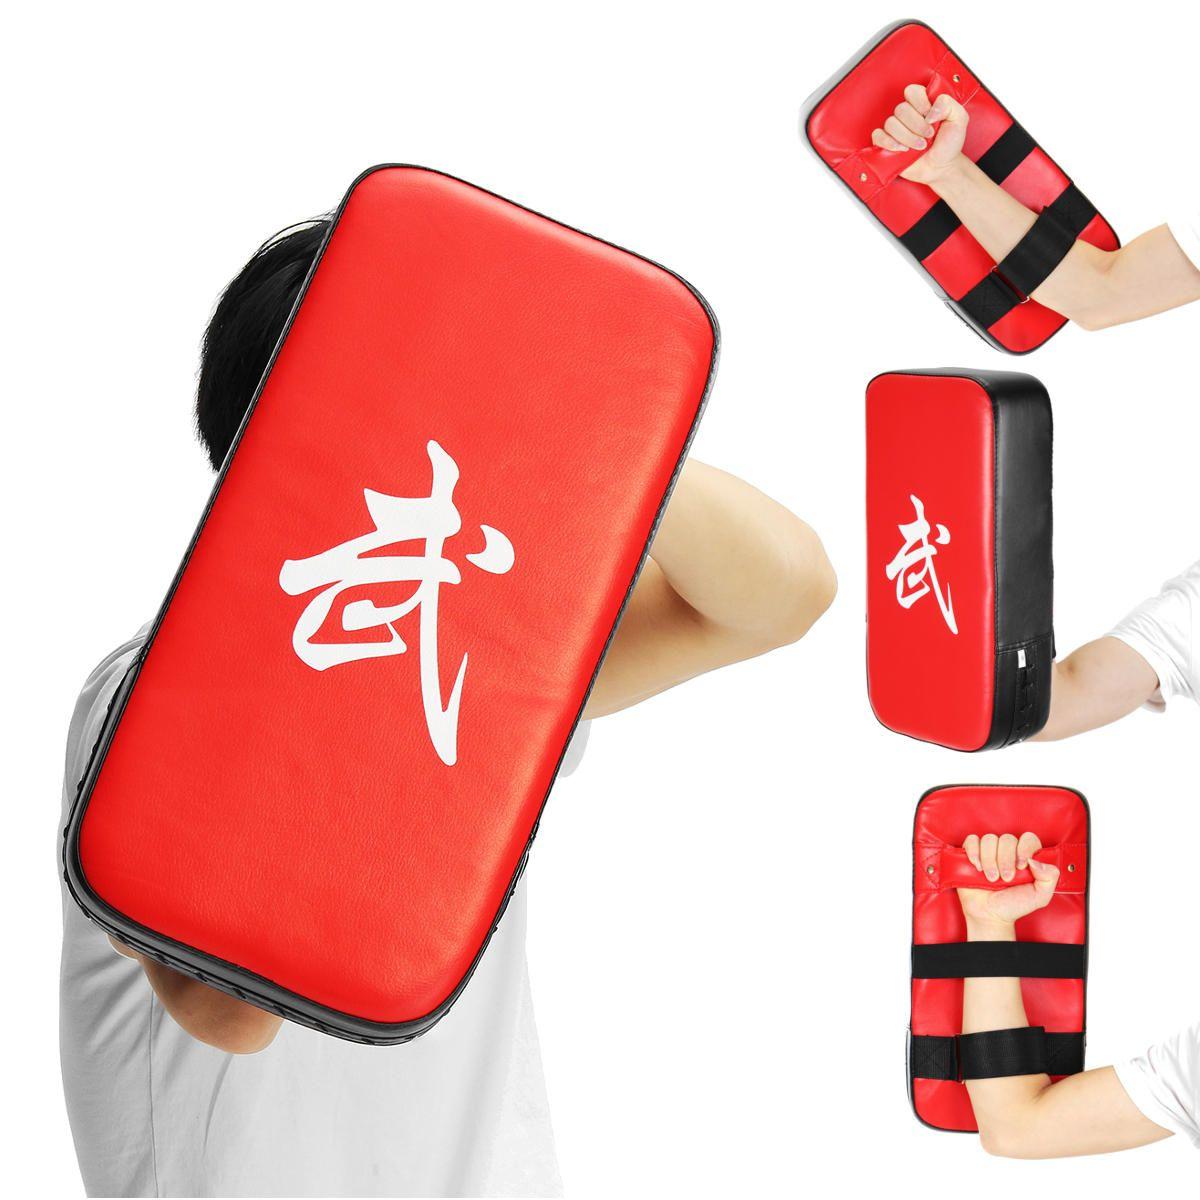 Muay Thai Karate MMA Taekwondo Boxing Target Focus Kick Shield Pad Equipment